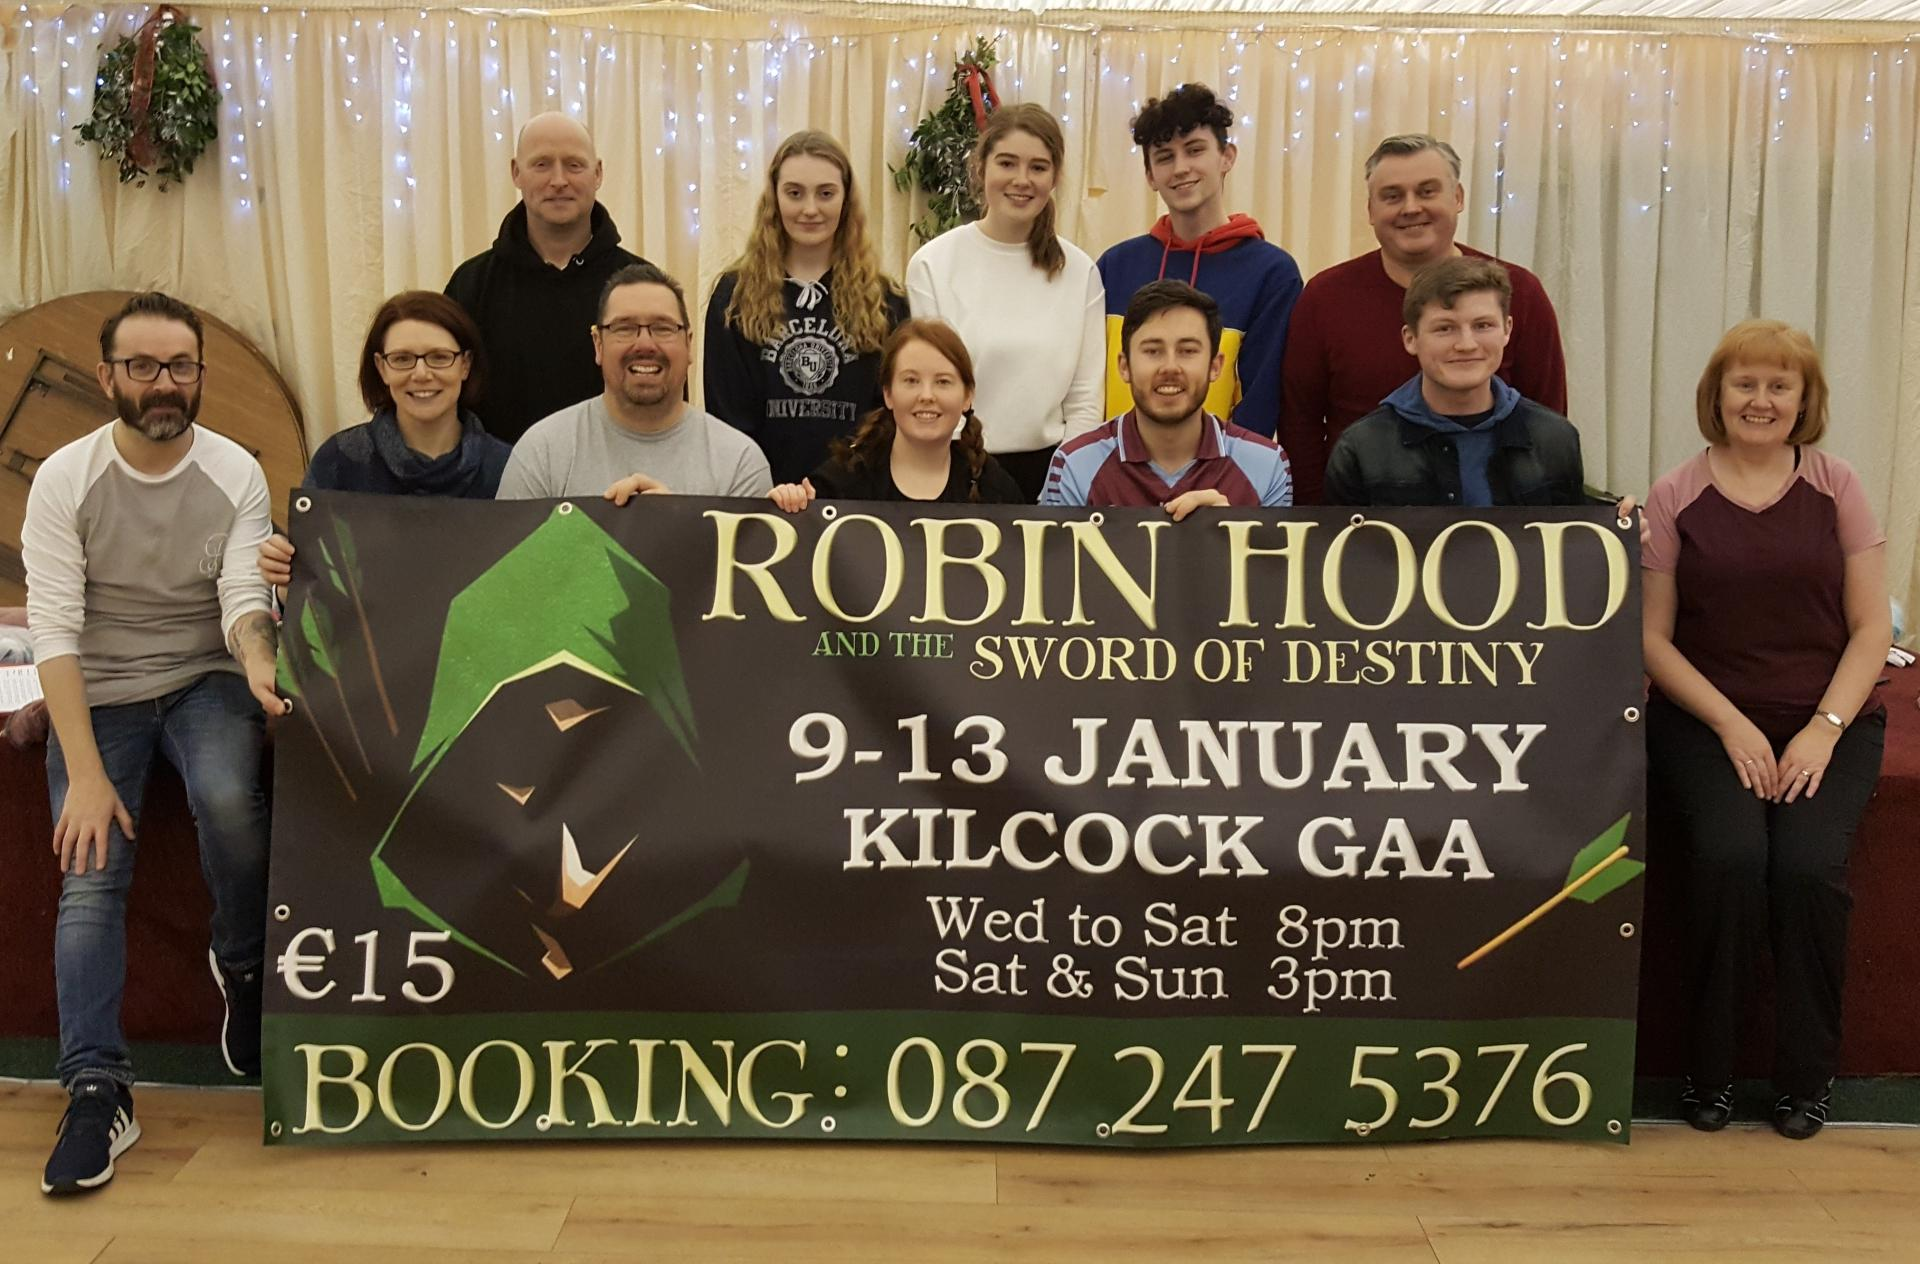 Kilcock, Ireland Game Events | Eventbrite